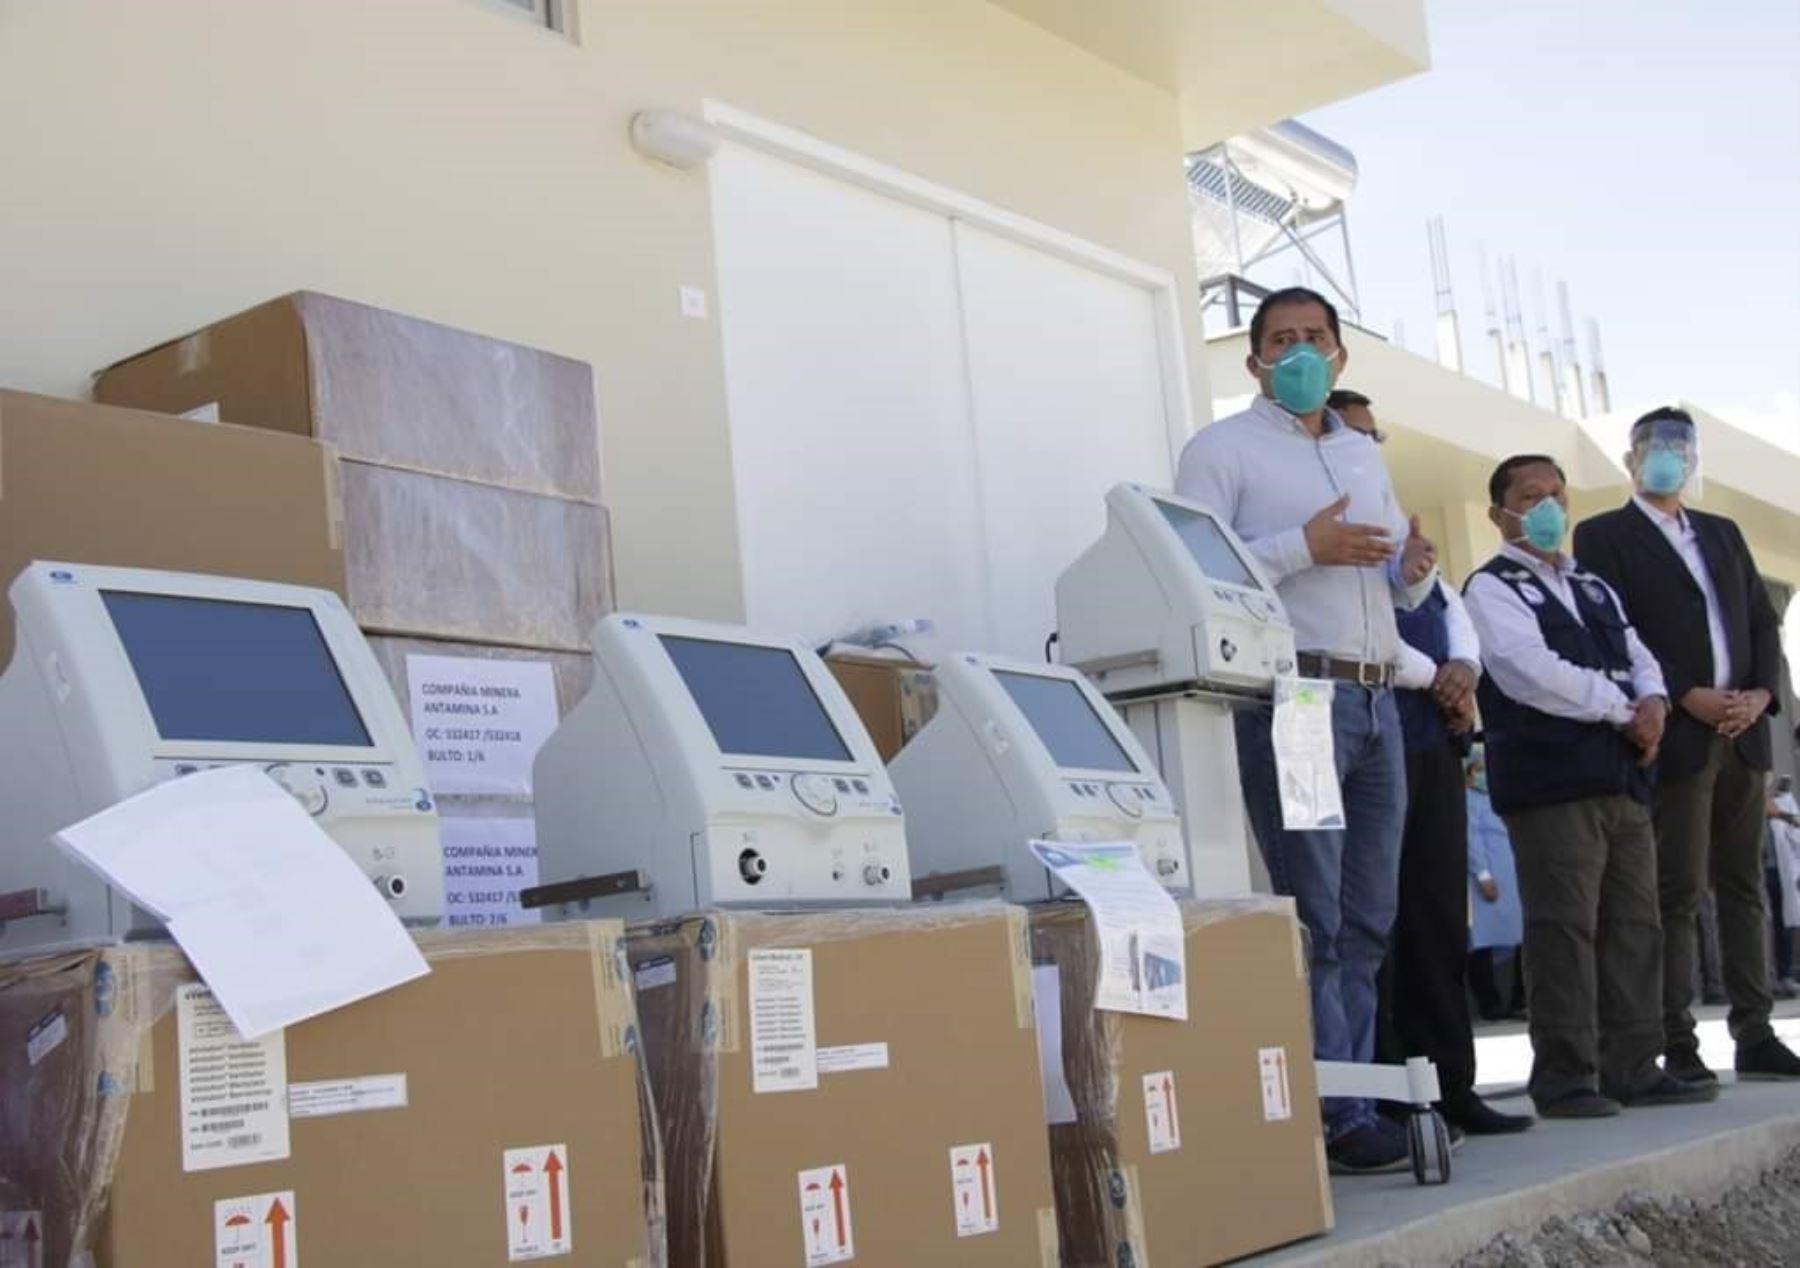 La minera Antamina donó doce ventiladores mecánicos al Hospital Víctor Ramos de Huaraz para reforzar la lucha contra el coronavirus en la capital de Áncash.